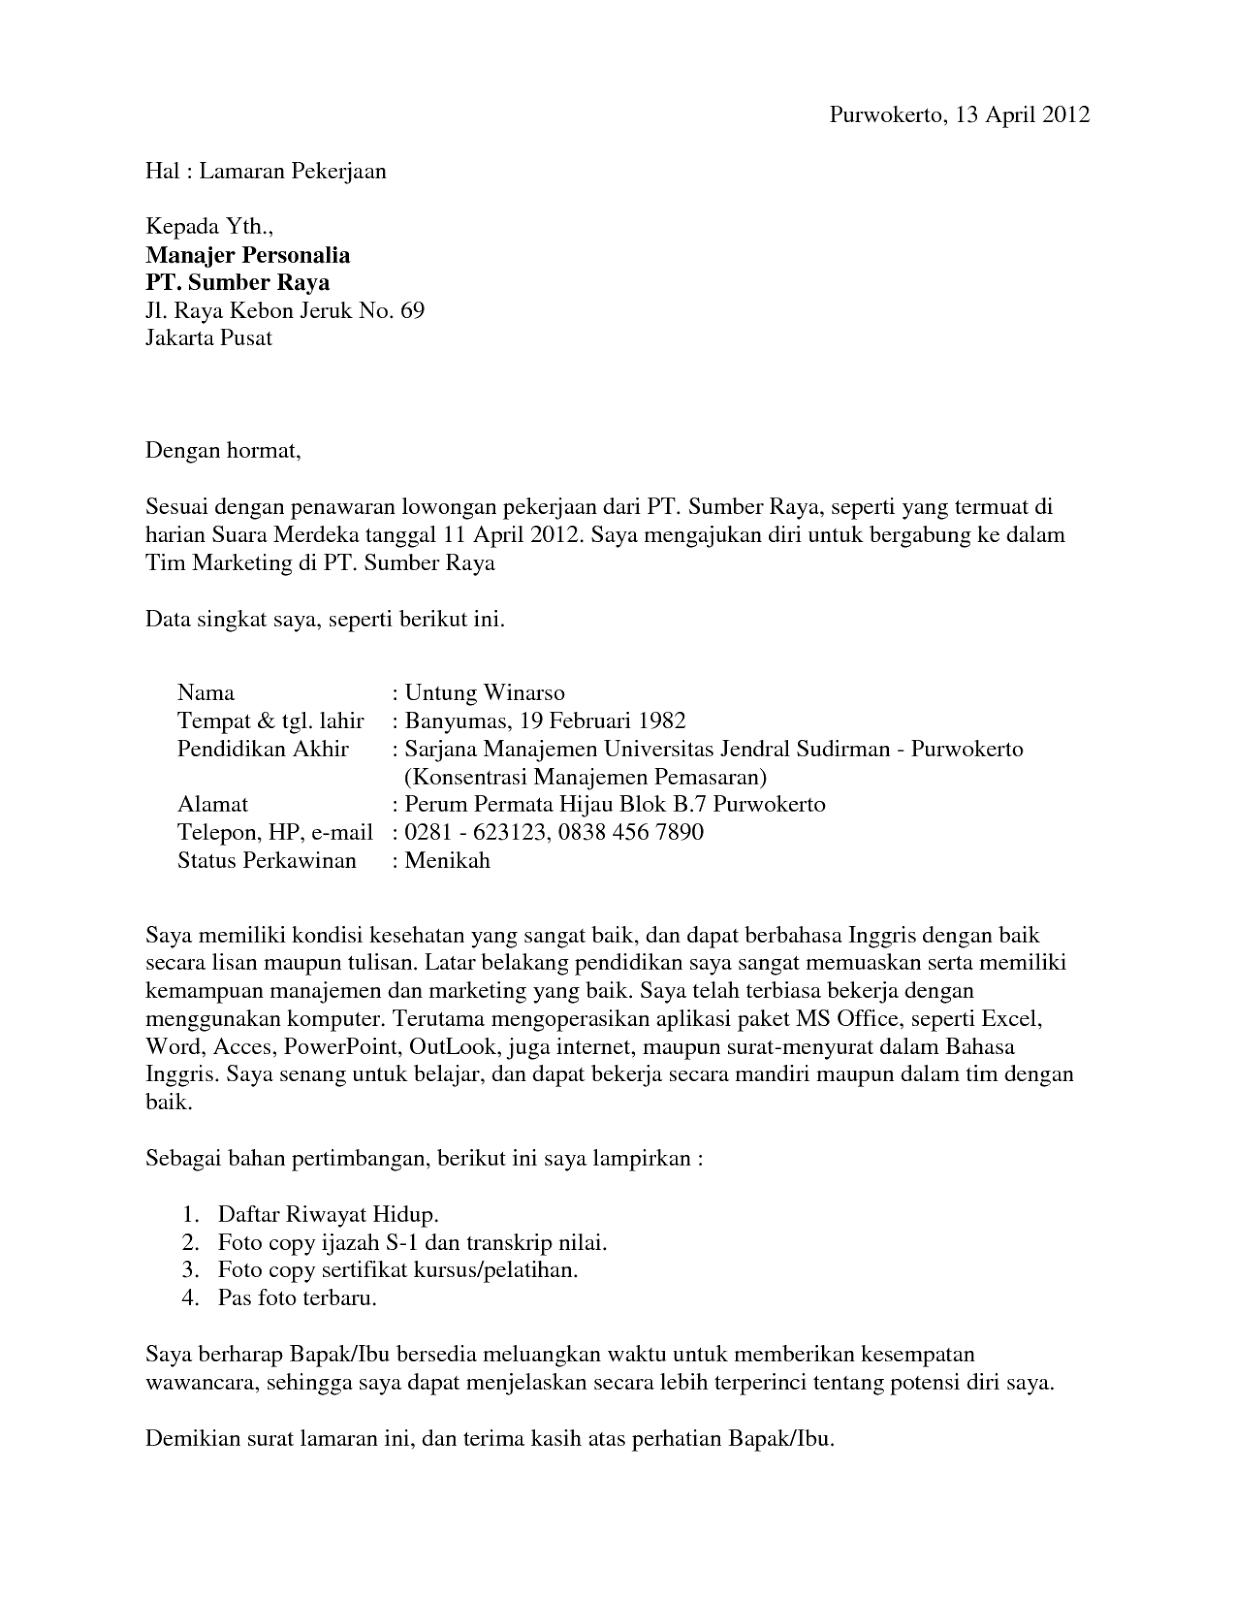 Surat Lamaran Kerja Quality Assurance - ben jobs